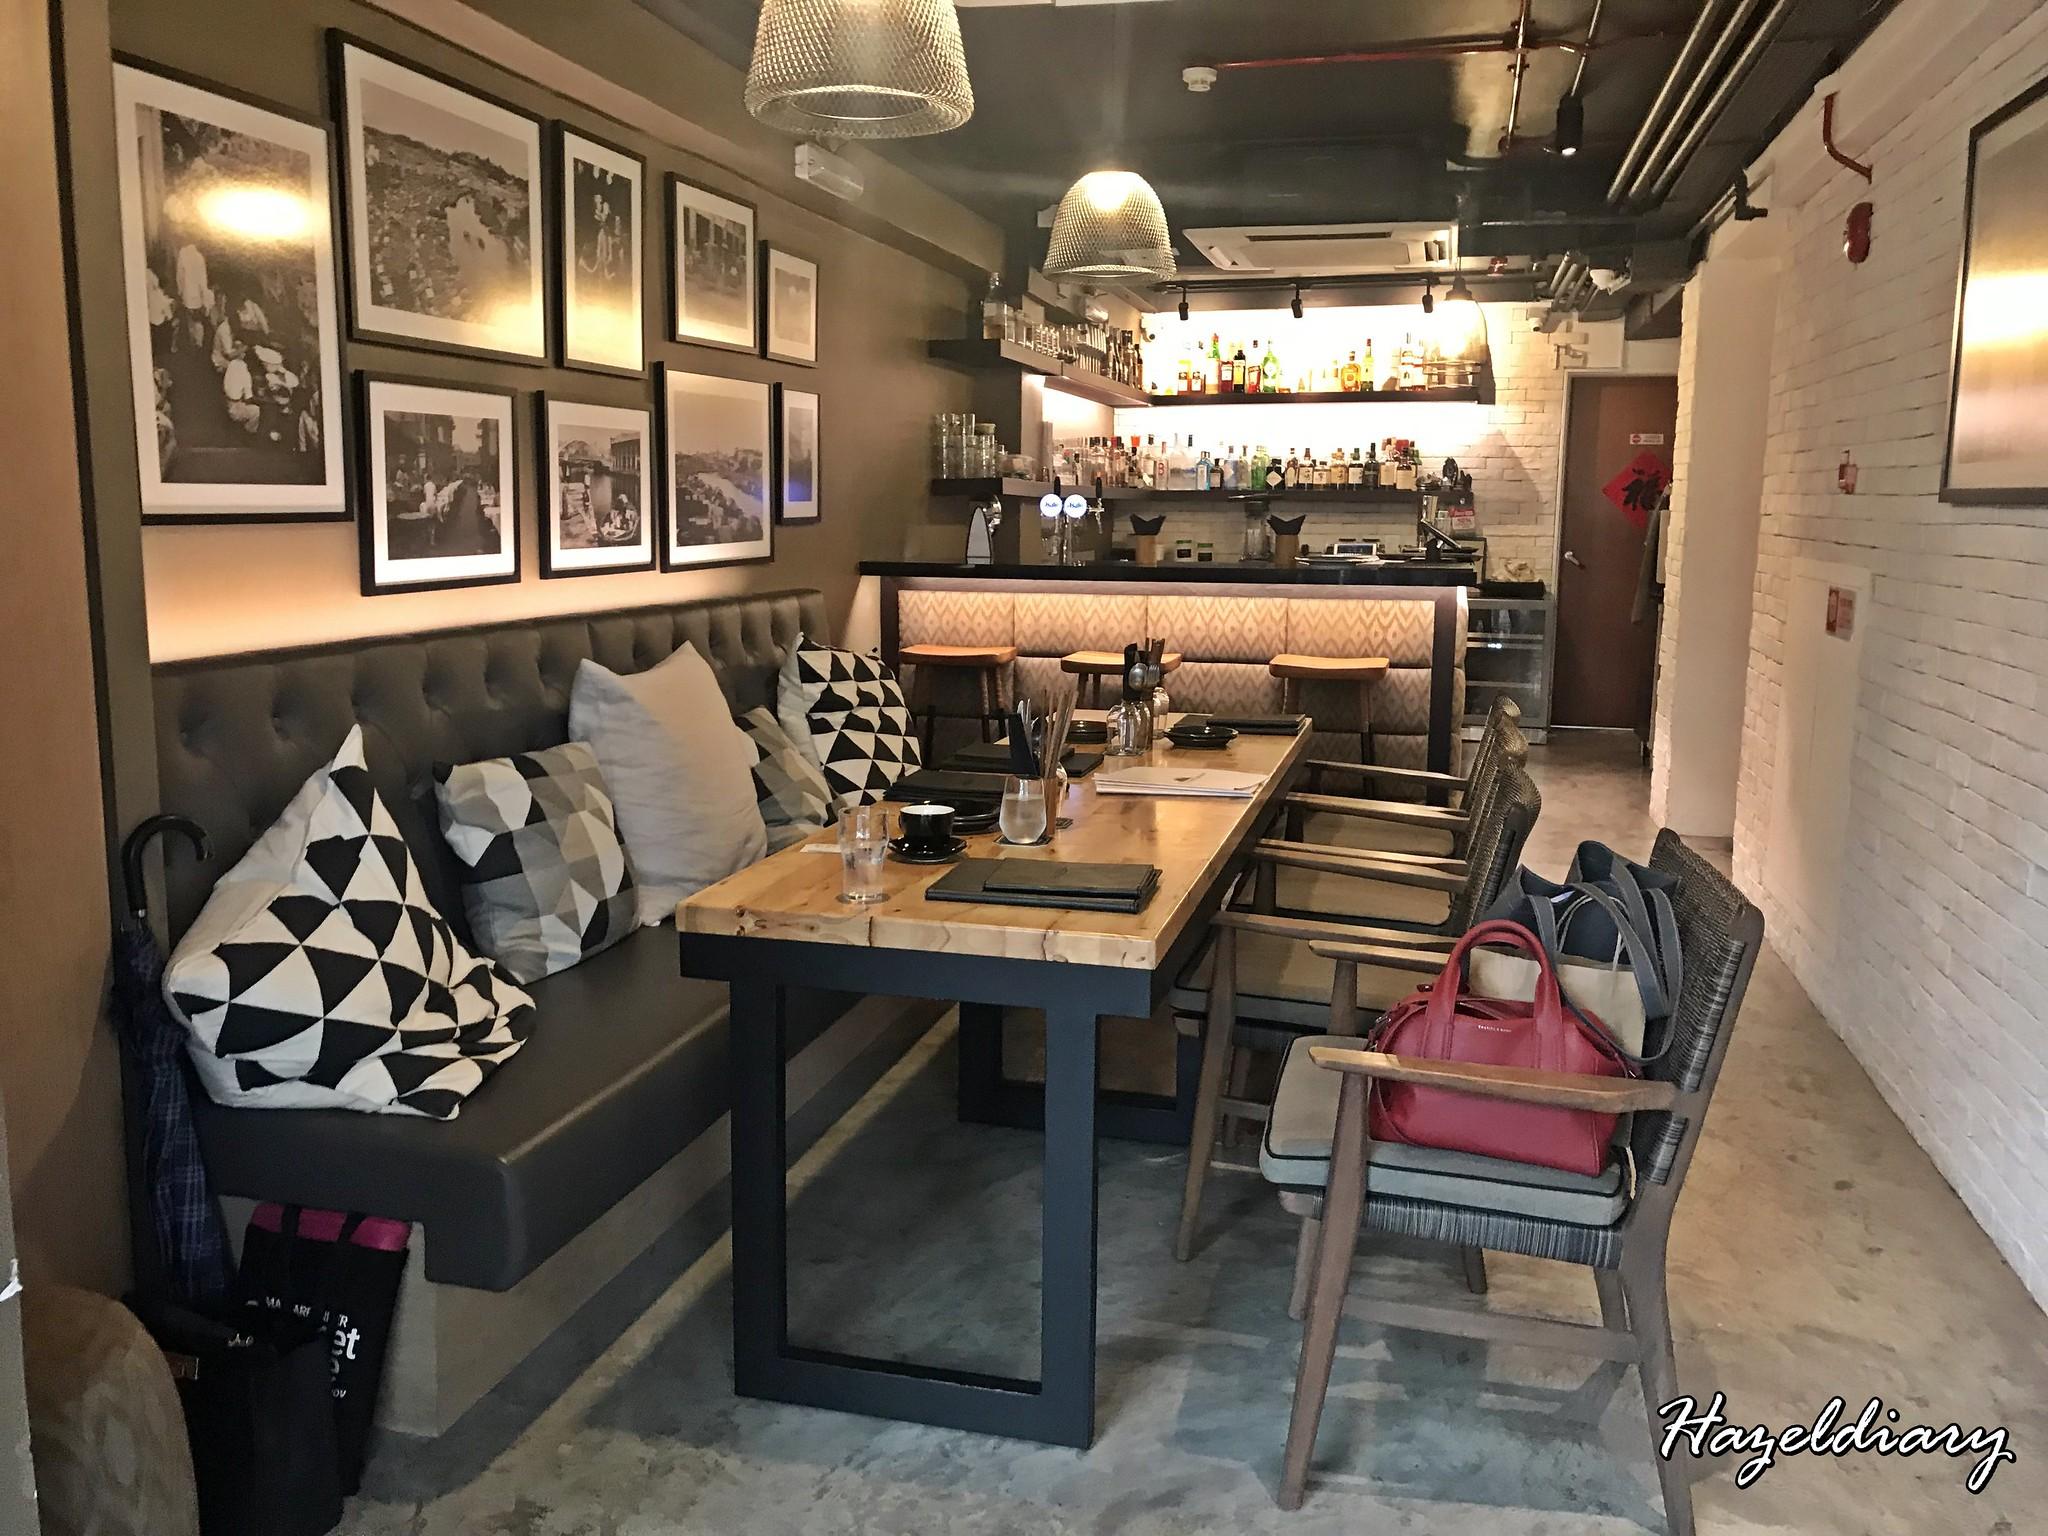 The Sampan Restaurant & Bar Boat Quay-2